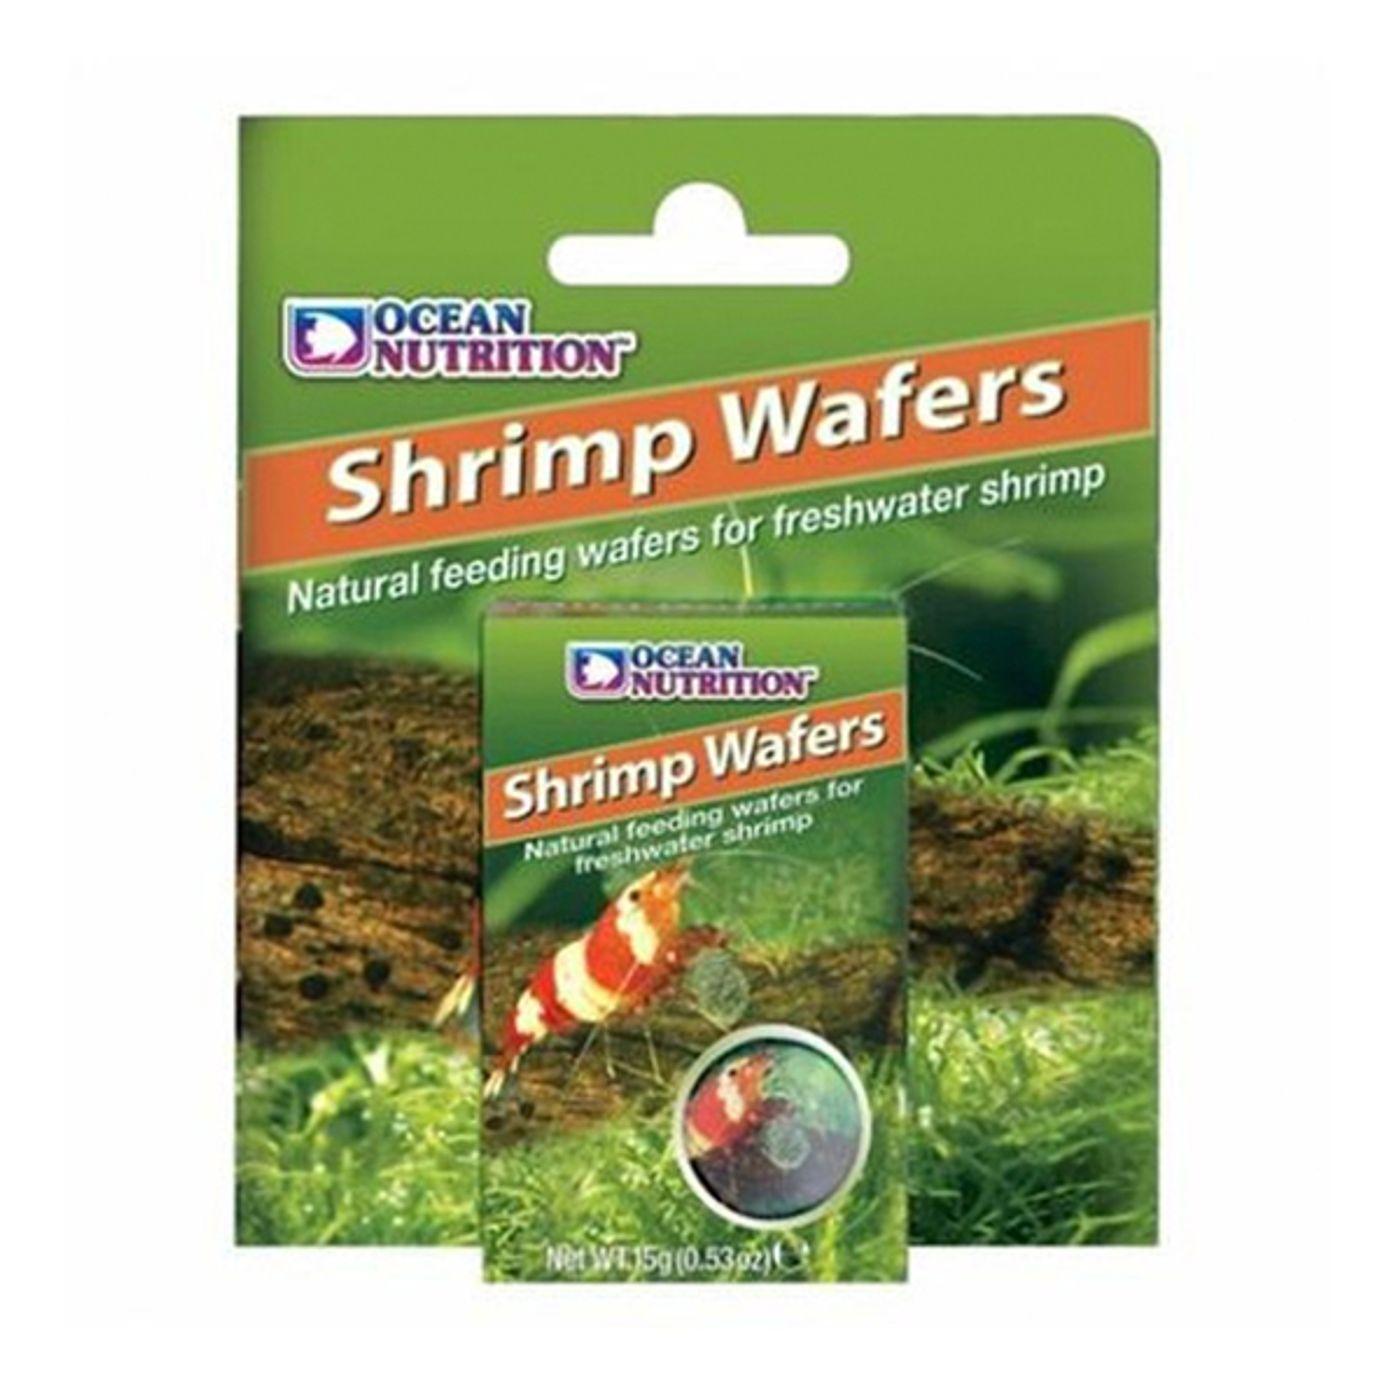 OCEAN-NUTRITION-Shrimp-Wafers-15g